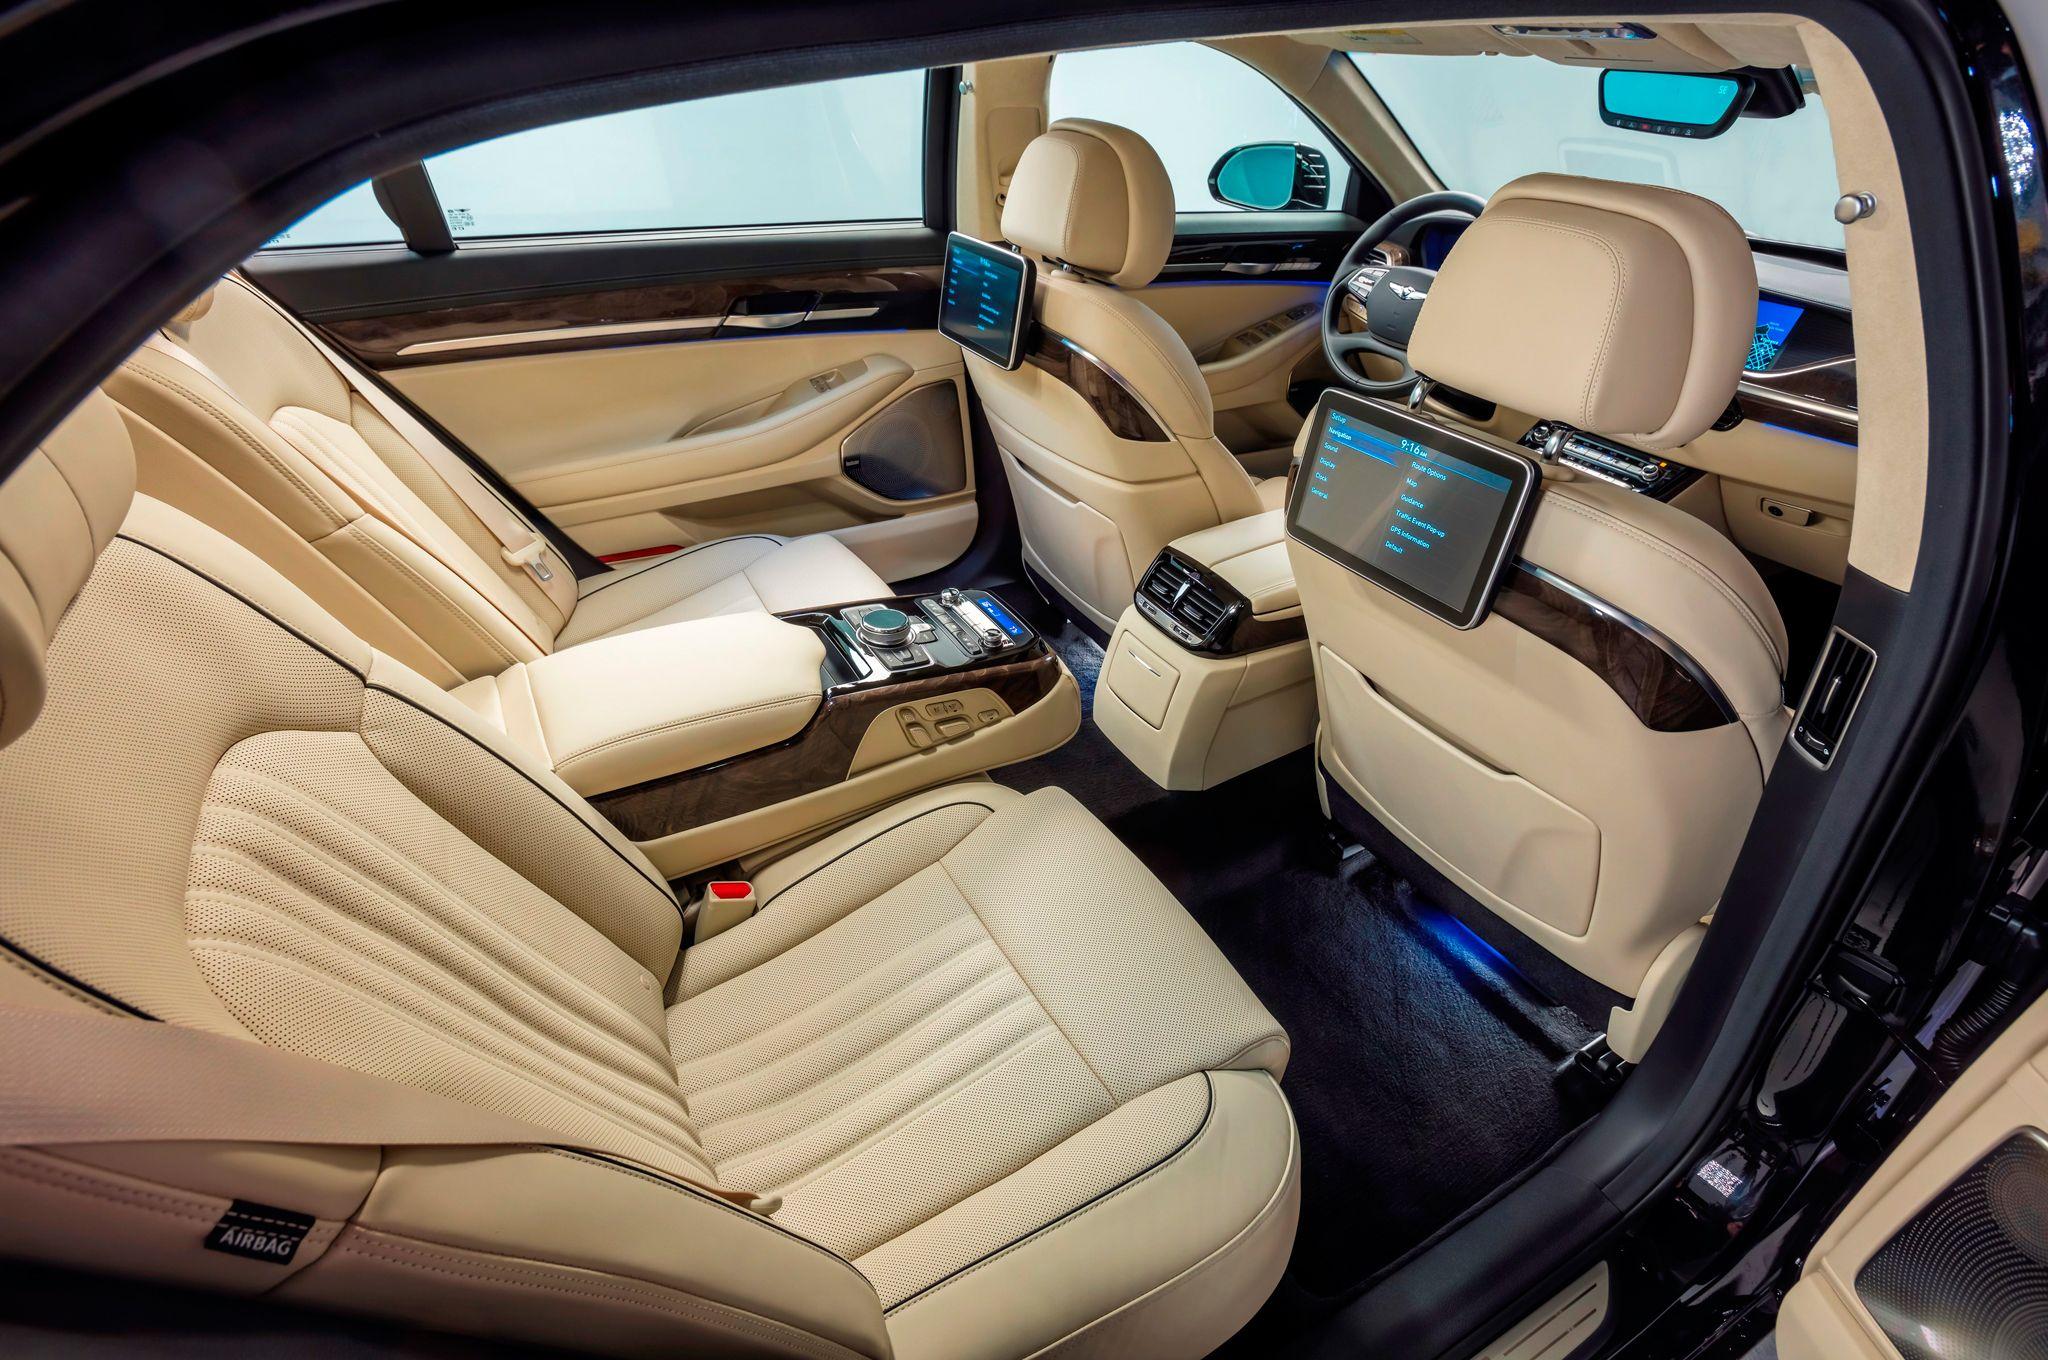 Wonderful 2016 Hyundai Genesis Interior   Hyundai   Pinterest   Hyundai Genesis, Cars  And Luxury Cars